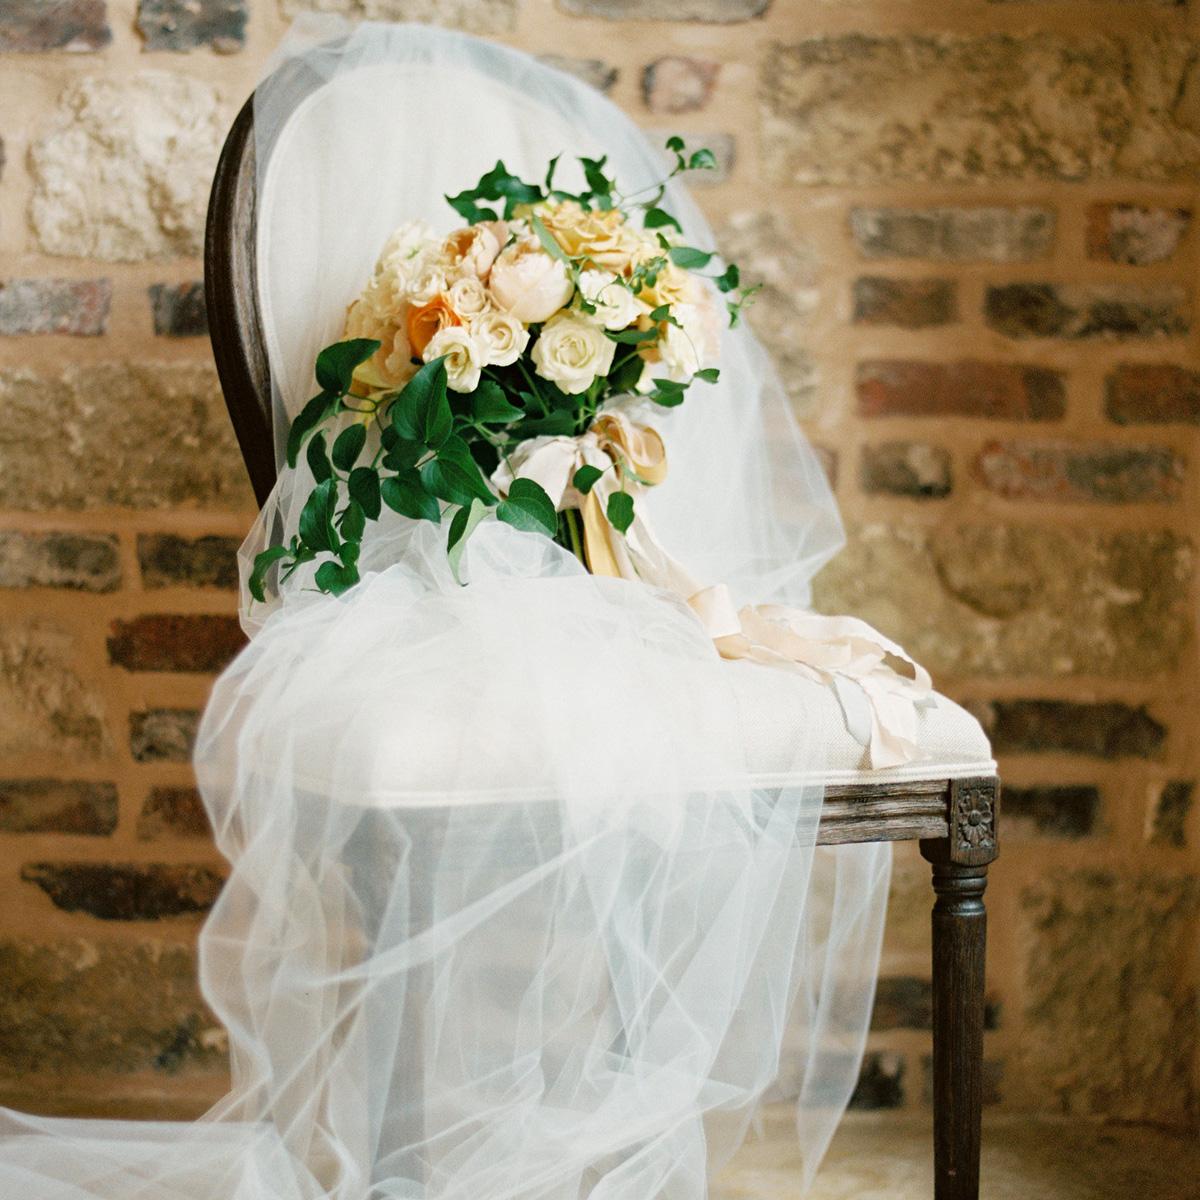 sprout-wedding-organic1.jpg